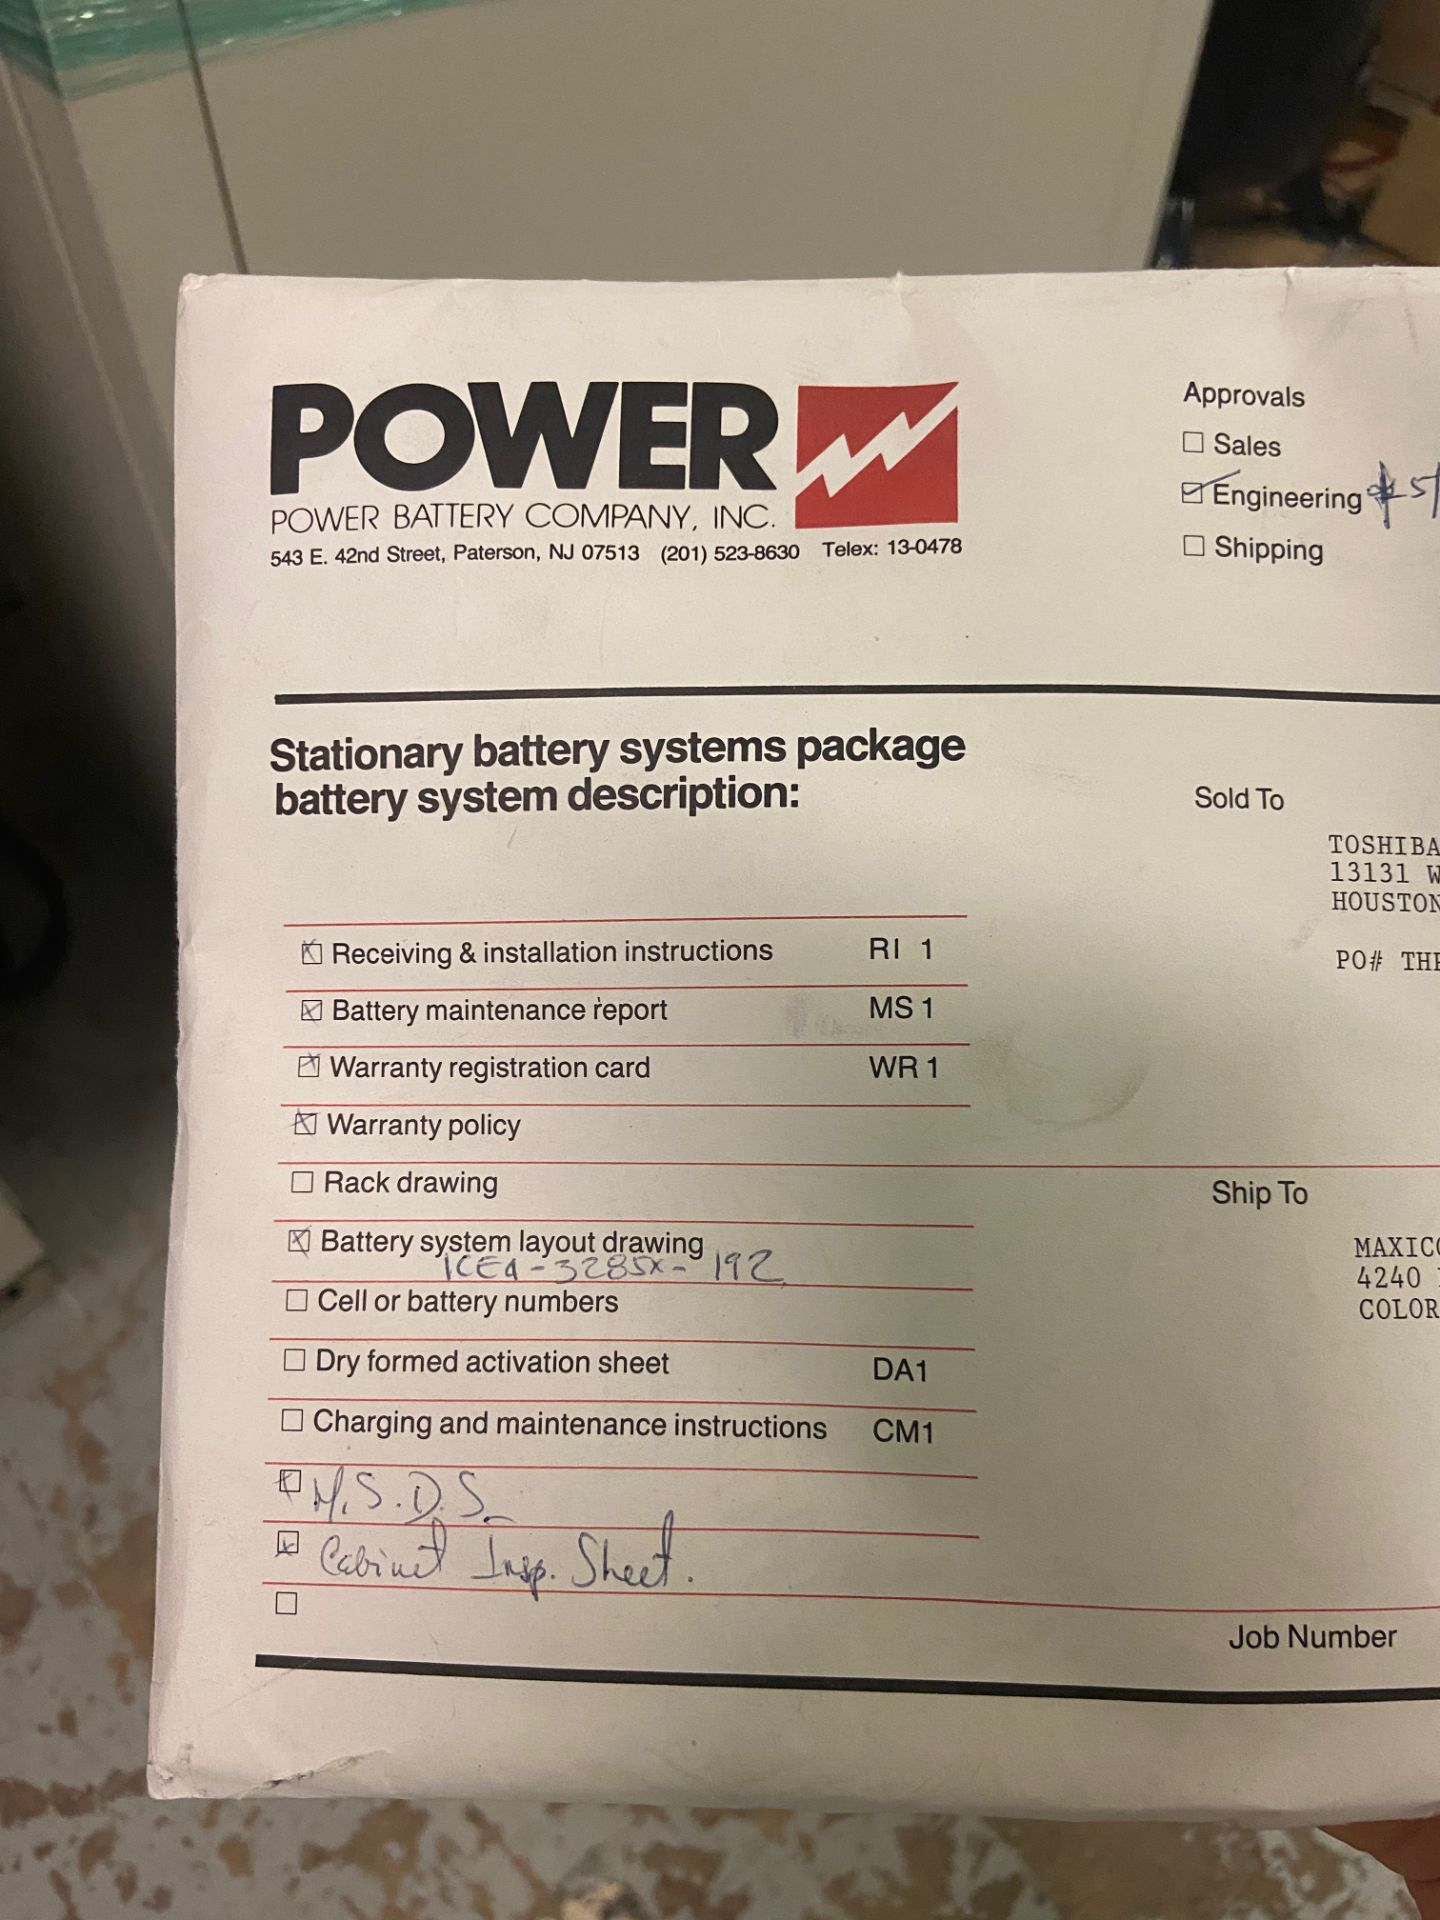 Mitsubishi Uninterruptible Power Supply, 2033A Series, Type UP2033A-B403SU-2, Serial# 96-GC8YQI-04, - Image 4 of 6